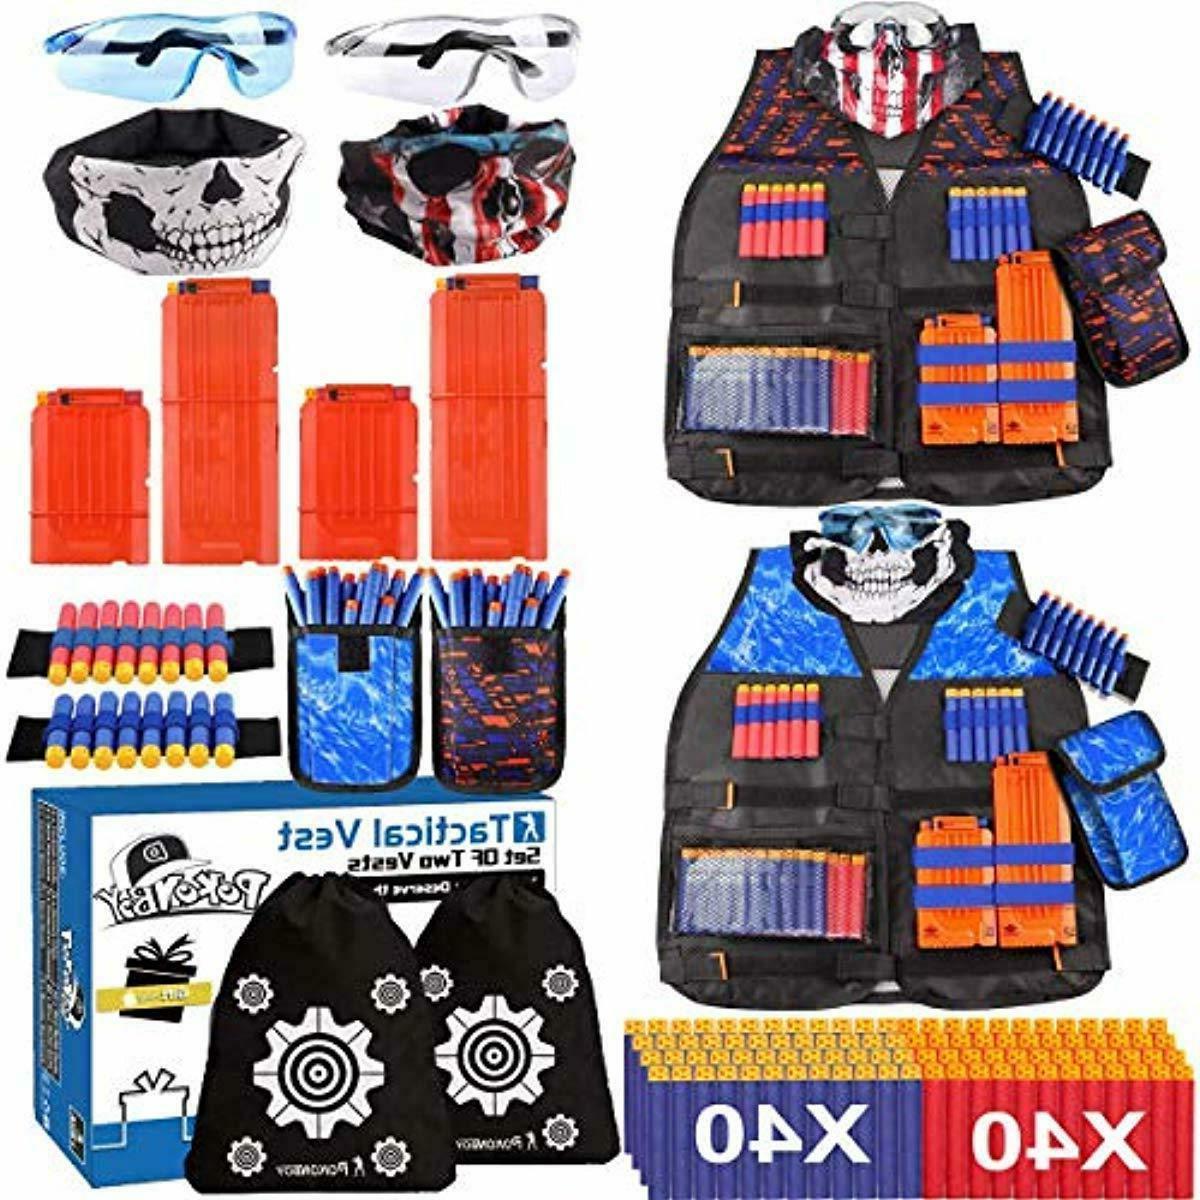 2 sets tactical vest kits compatible